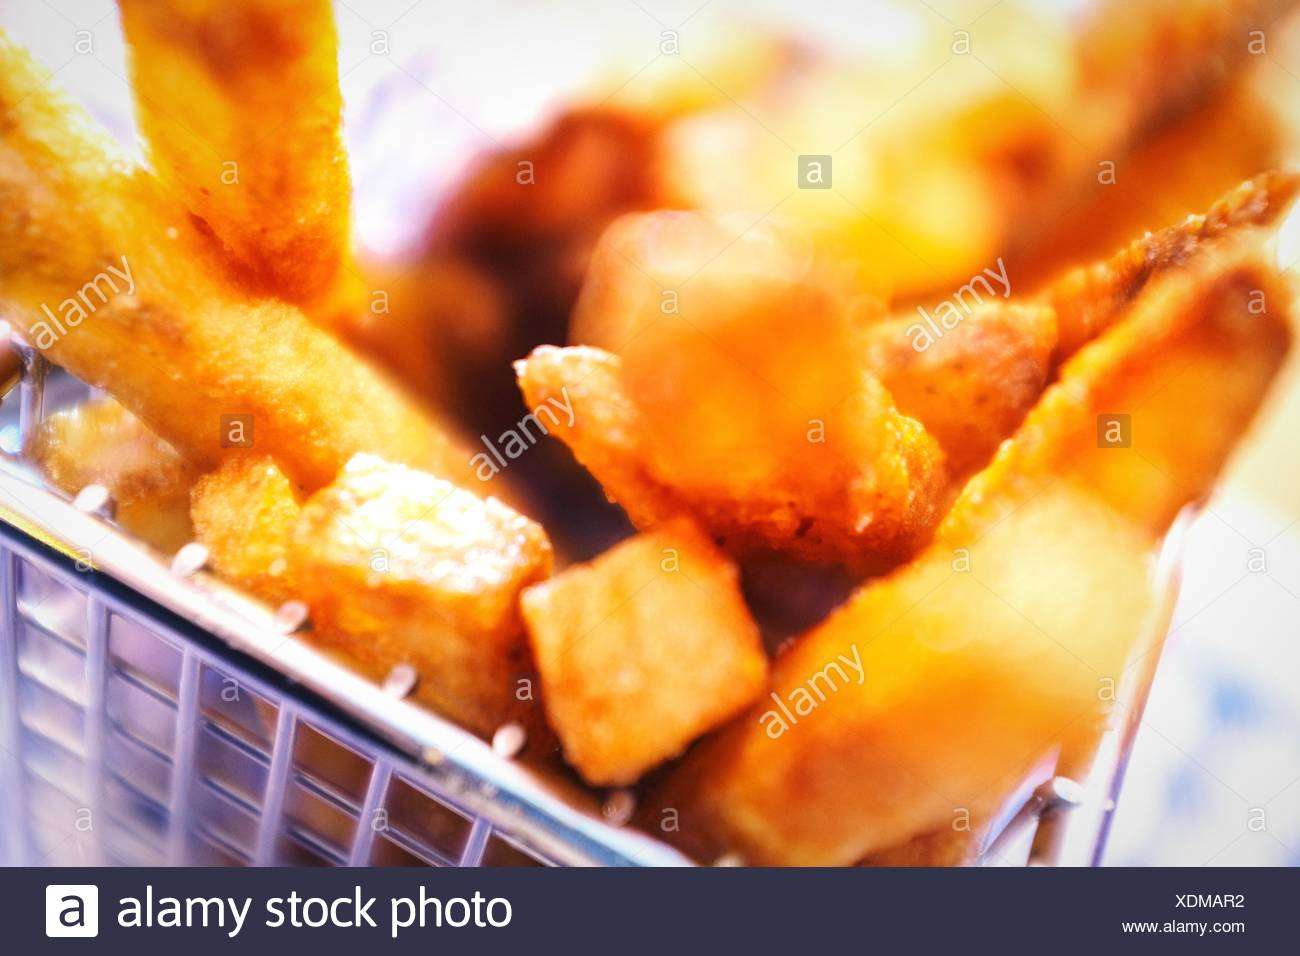 Nahaufnahme von Pommes frites im Container Stockbild